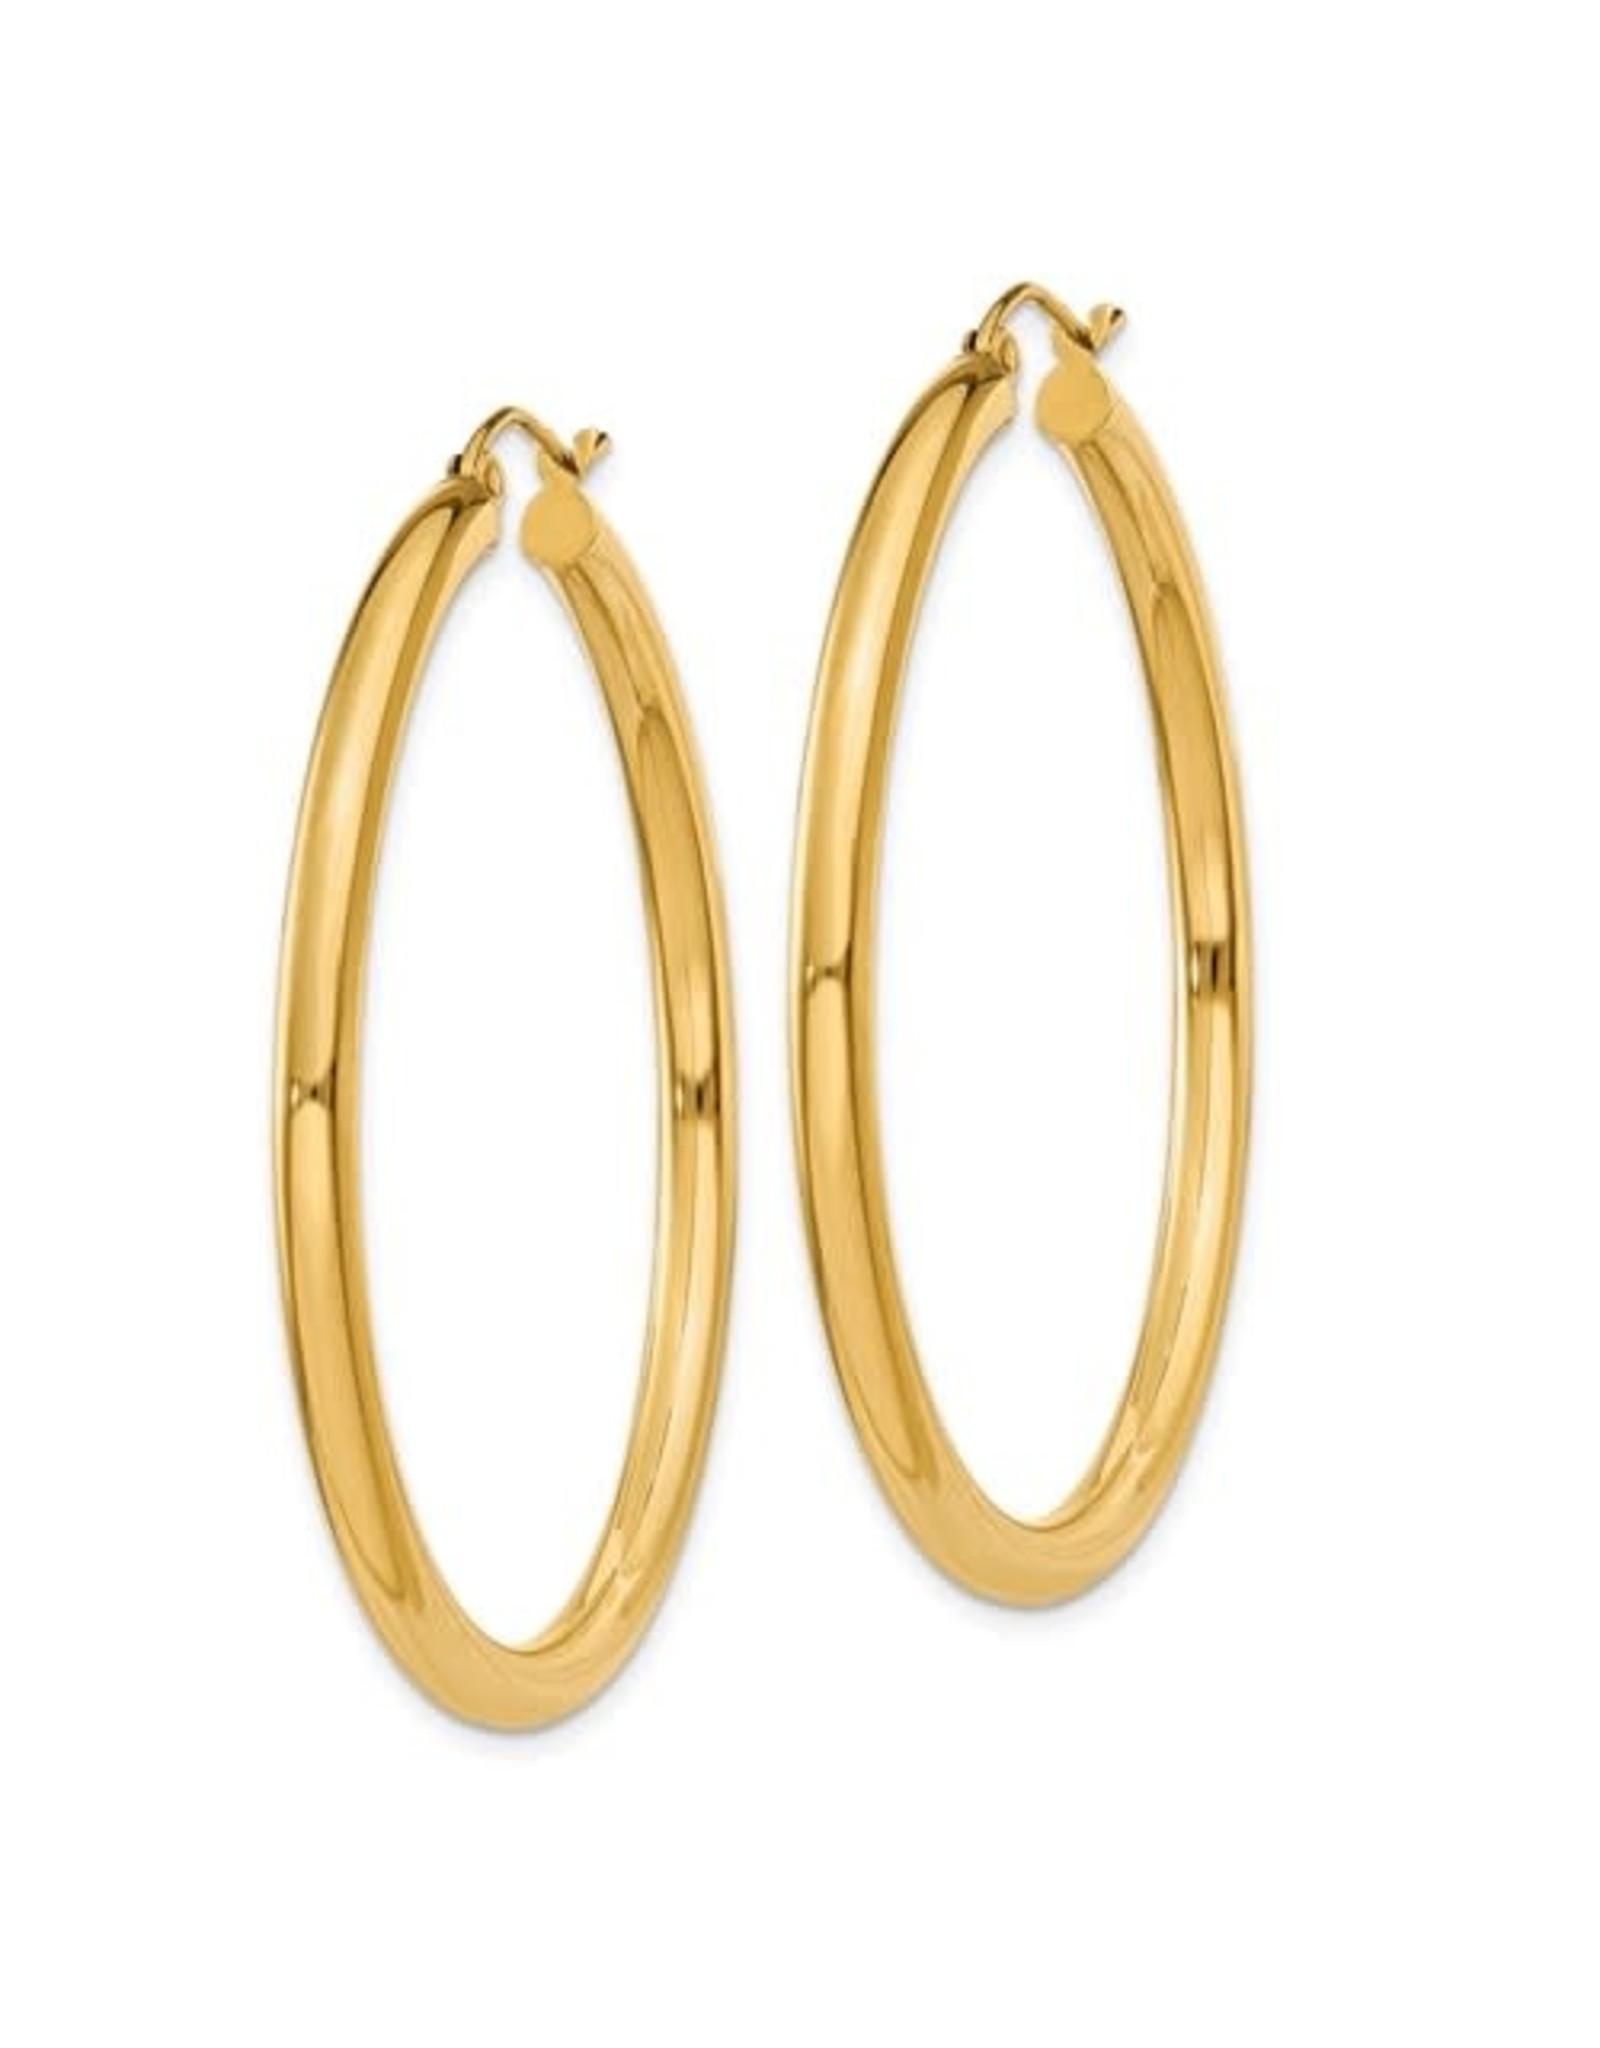 "14K Lightweight Classic 3mm Tube Hoop Earrings, 1.75"", 2.20dwts"